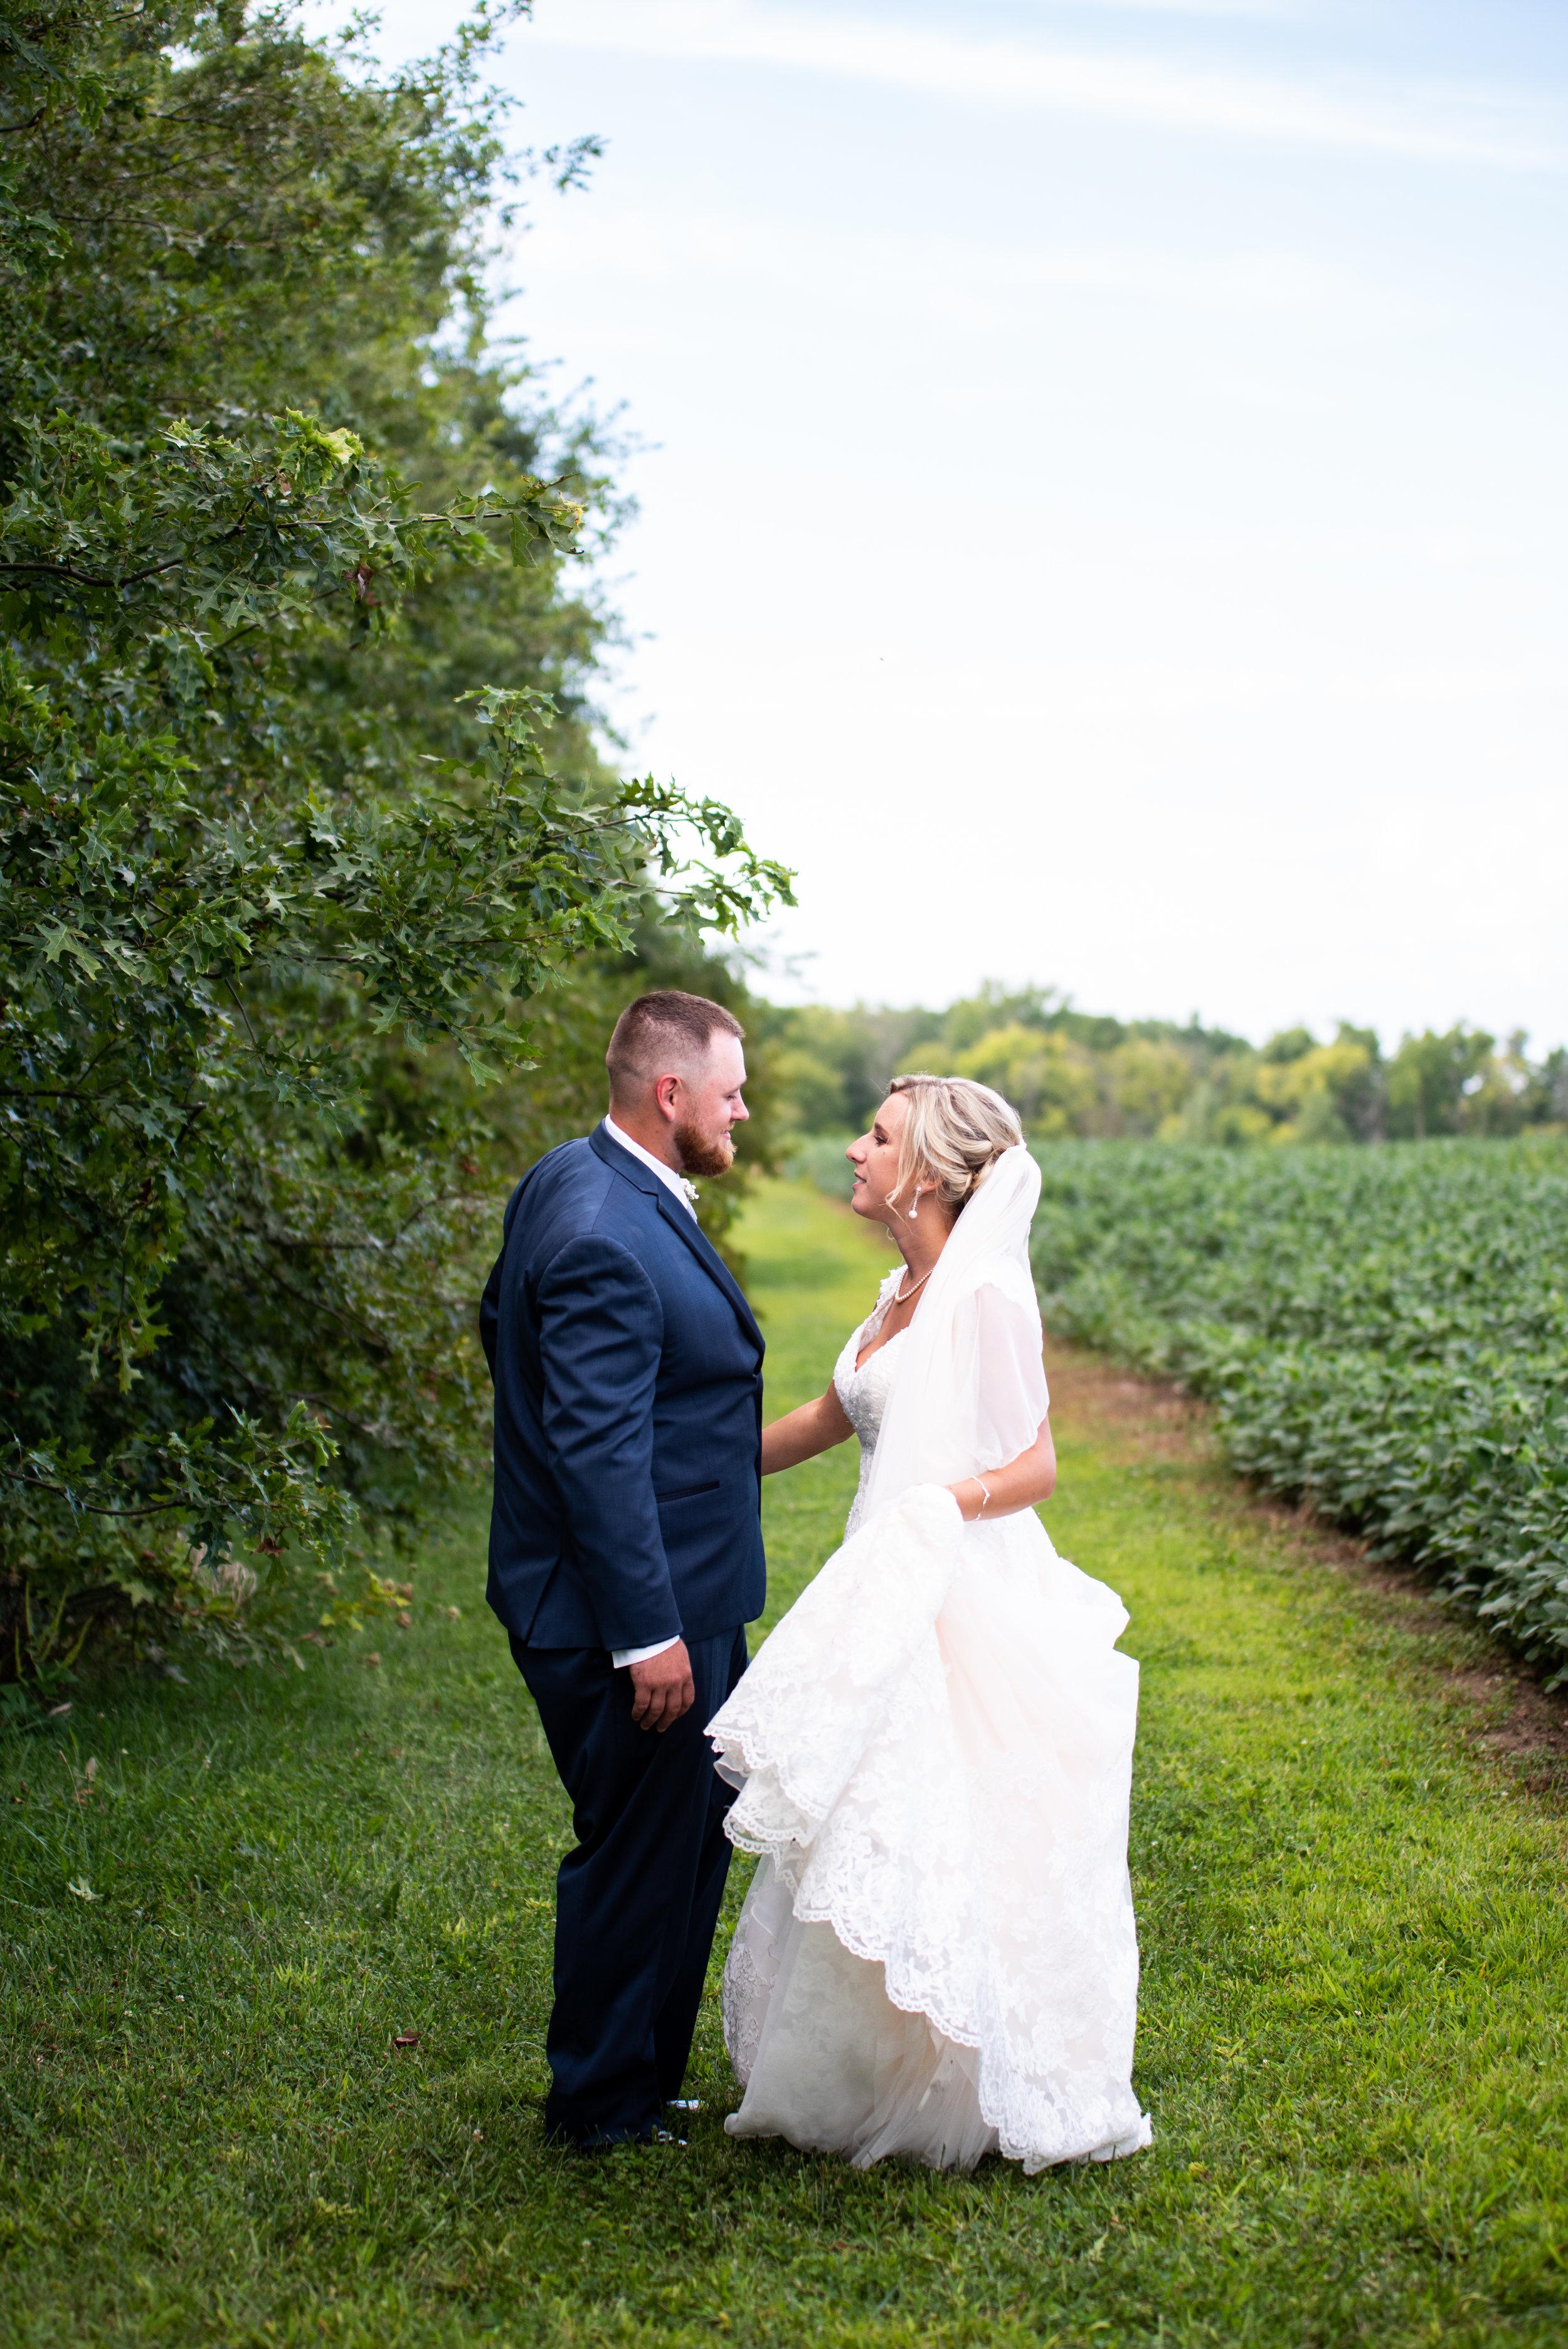 wedding (1 of 1)-169.jpg